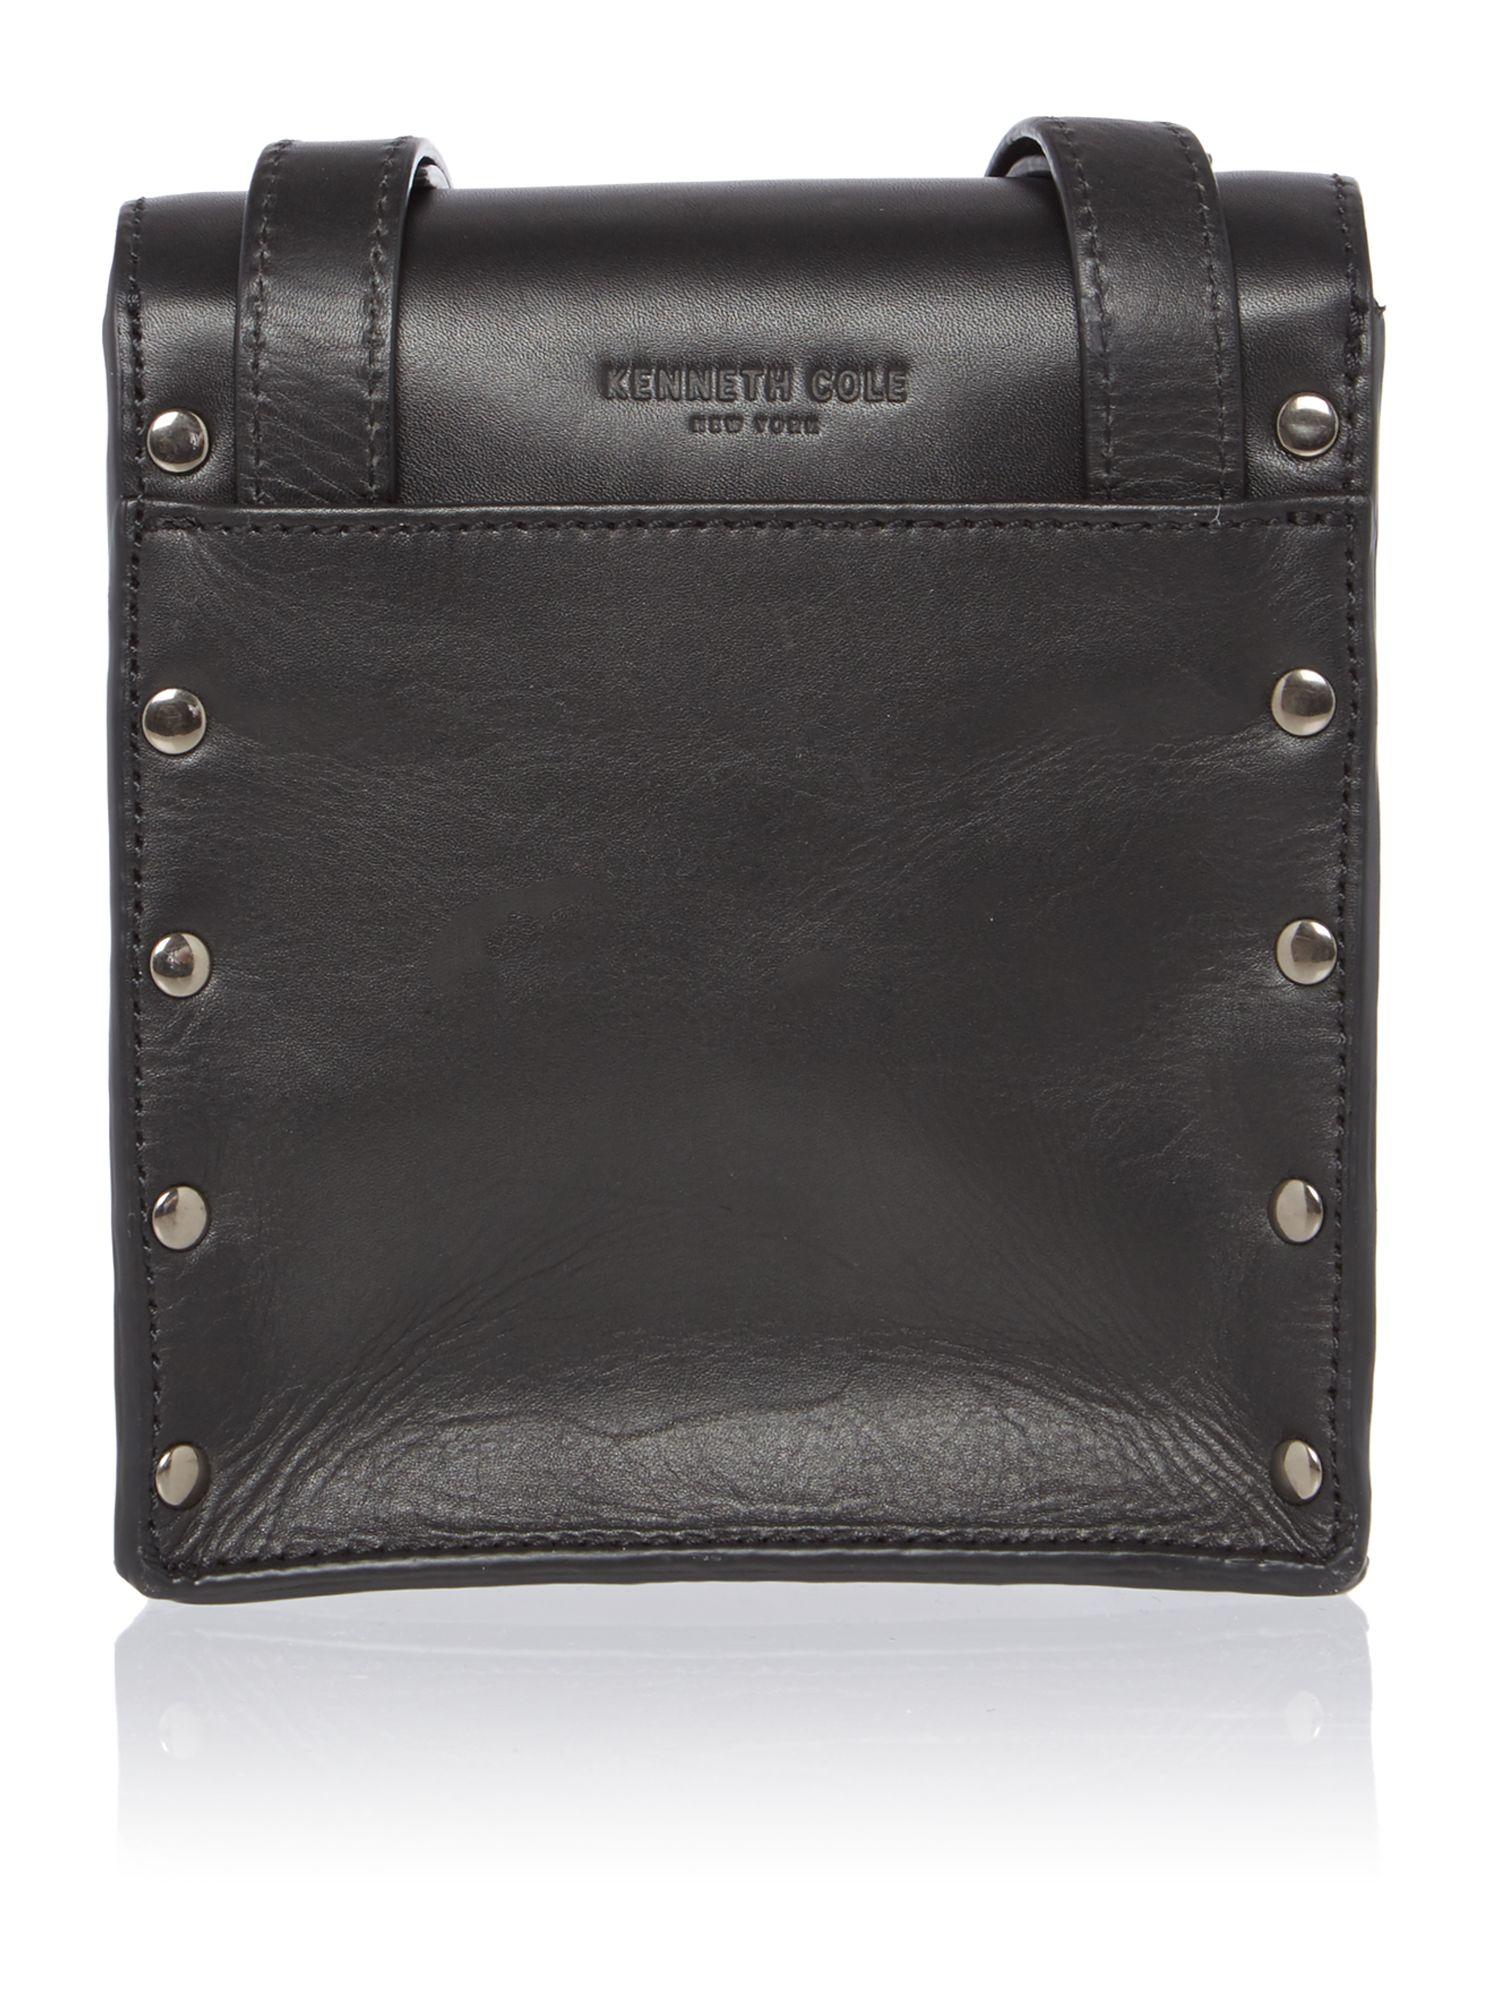 Kenneth Cole Cooper Black Small Crossbody Bag